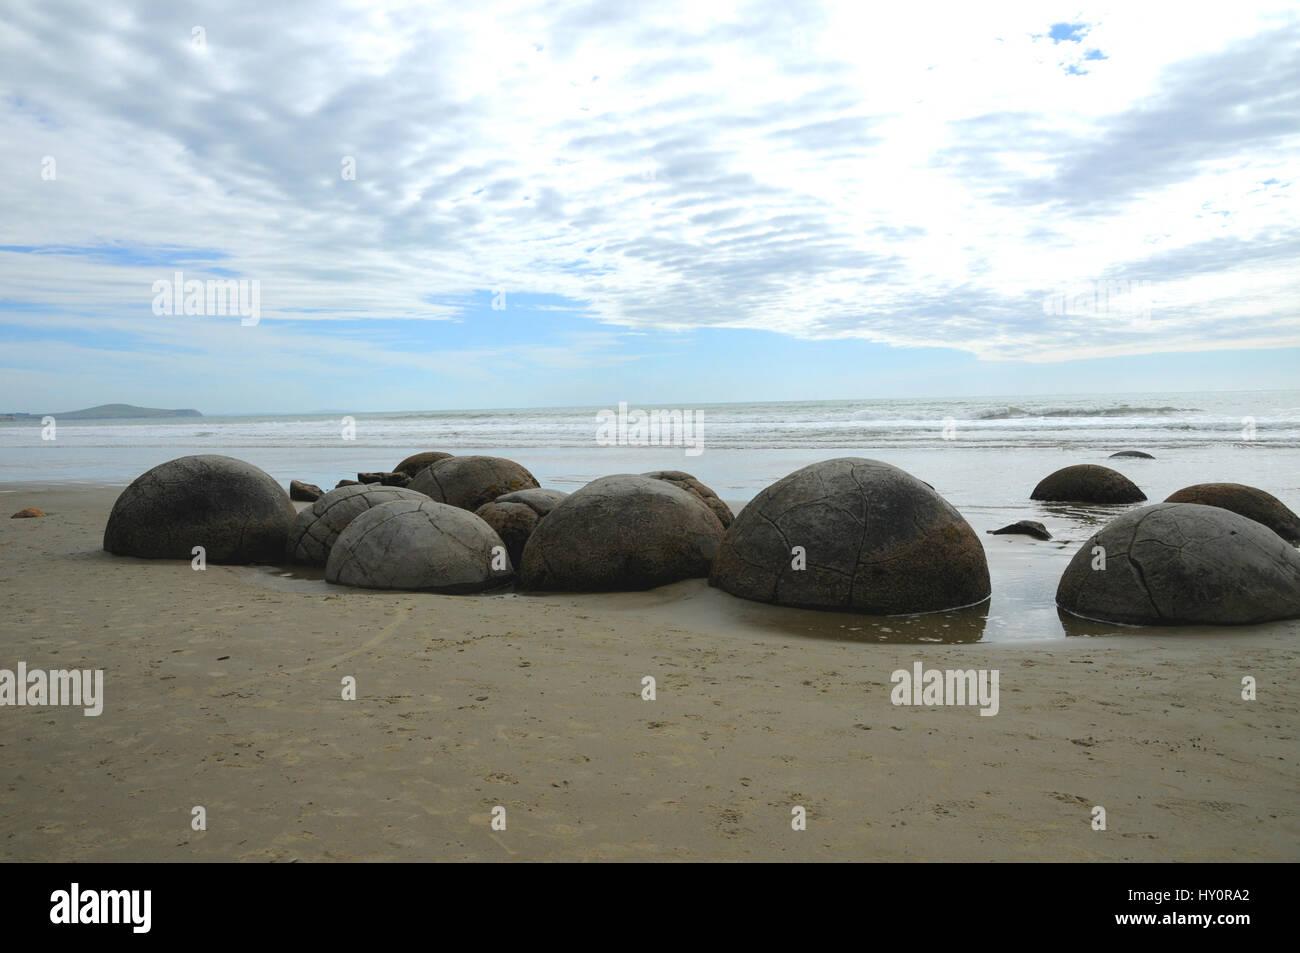 The Moeraki Boulders on Koekohe Beach on the Otago coast of New Zealand's South Island. They are a popular tourist - Stock Image